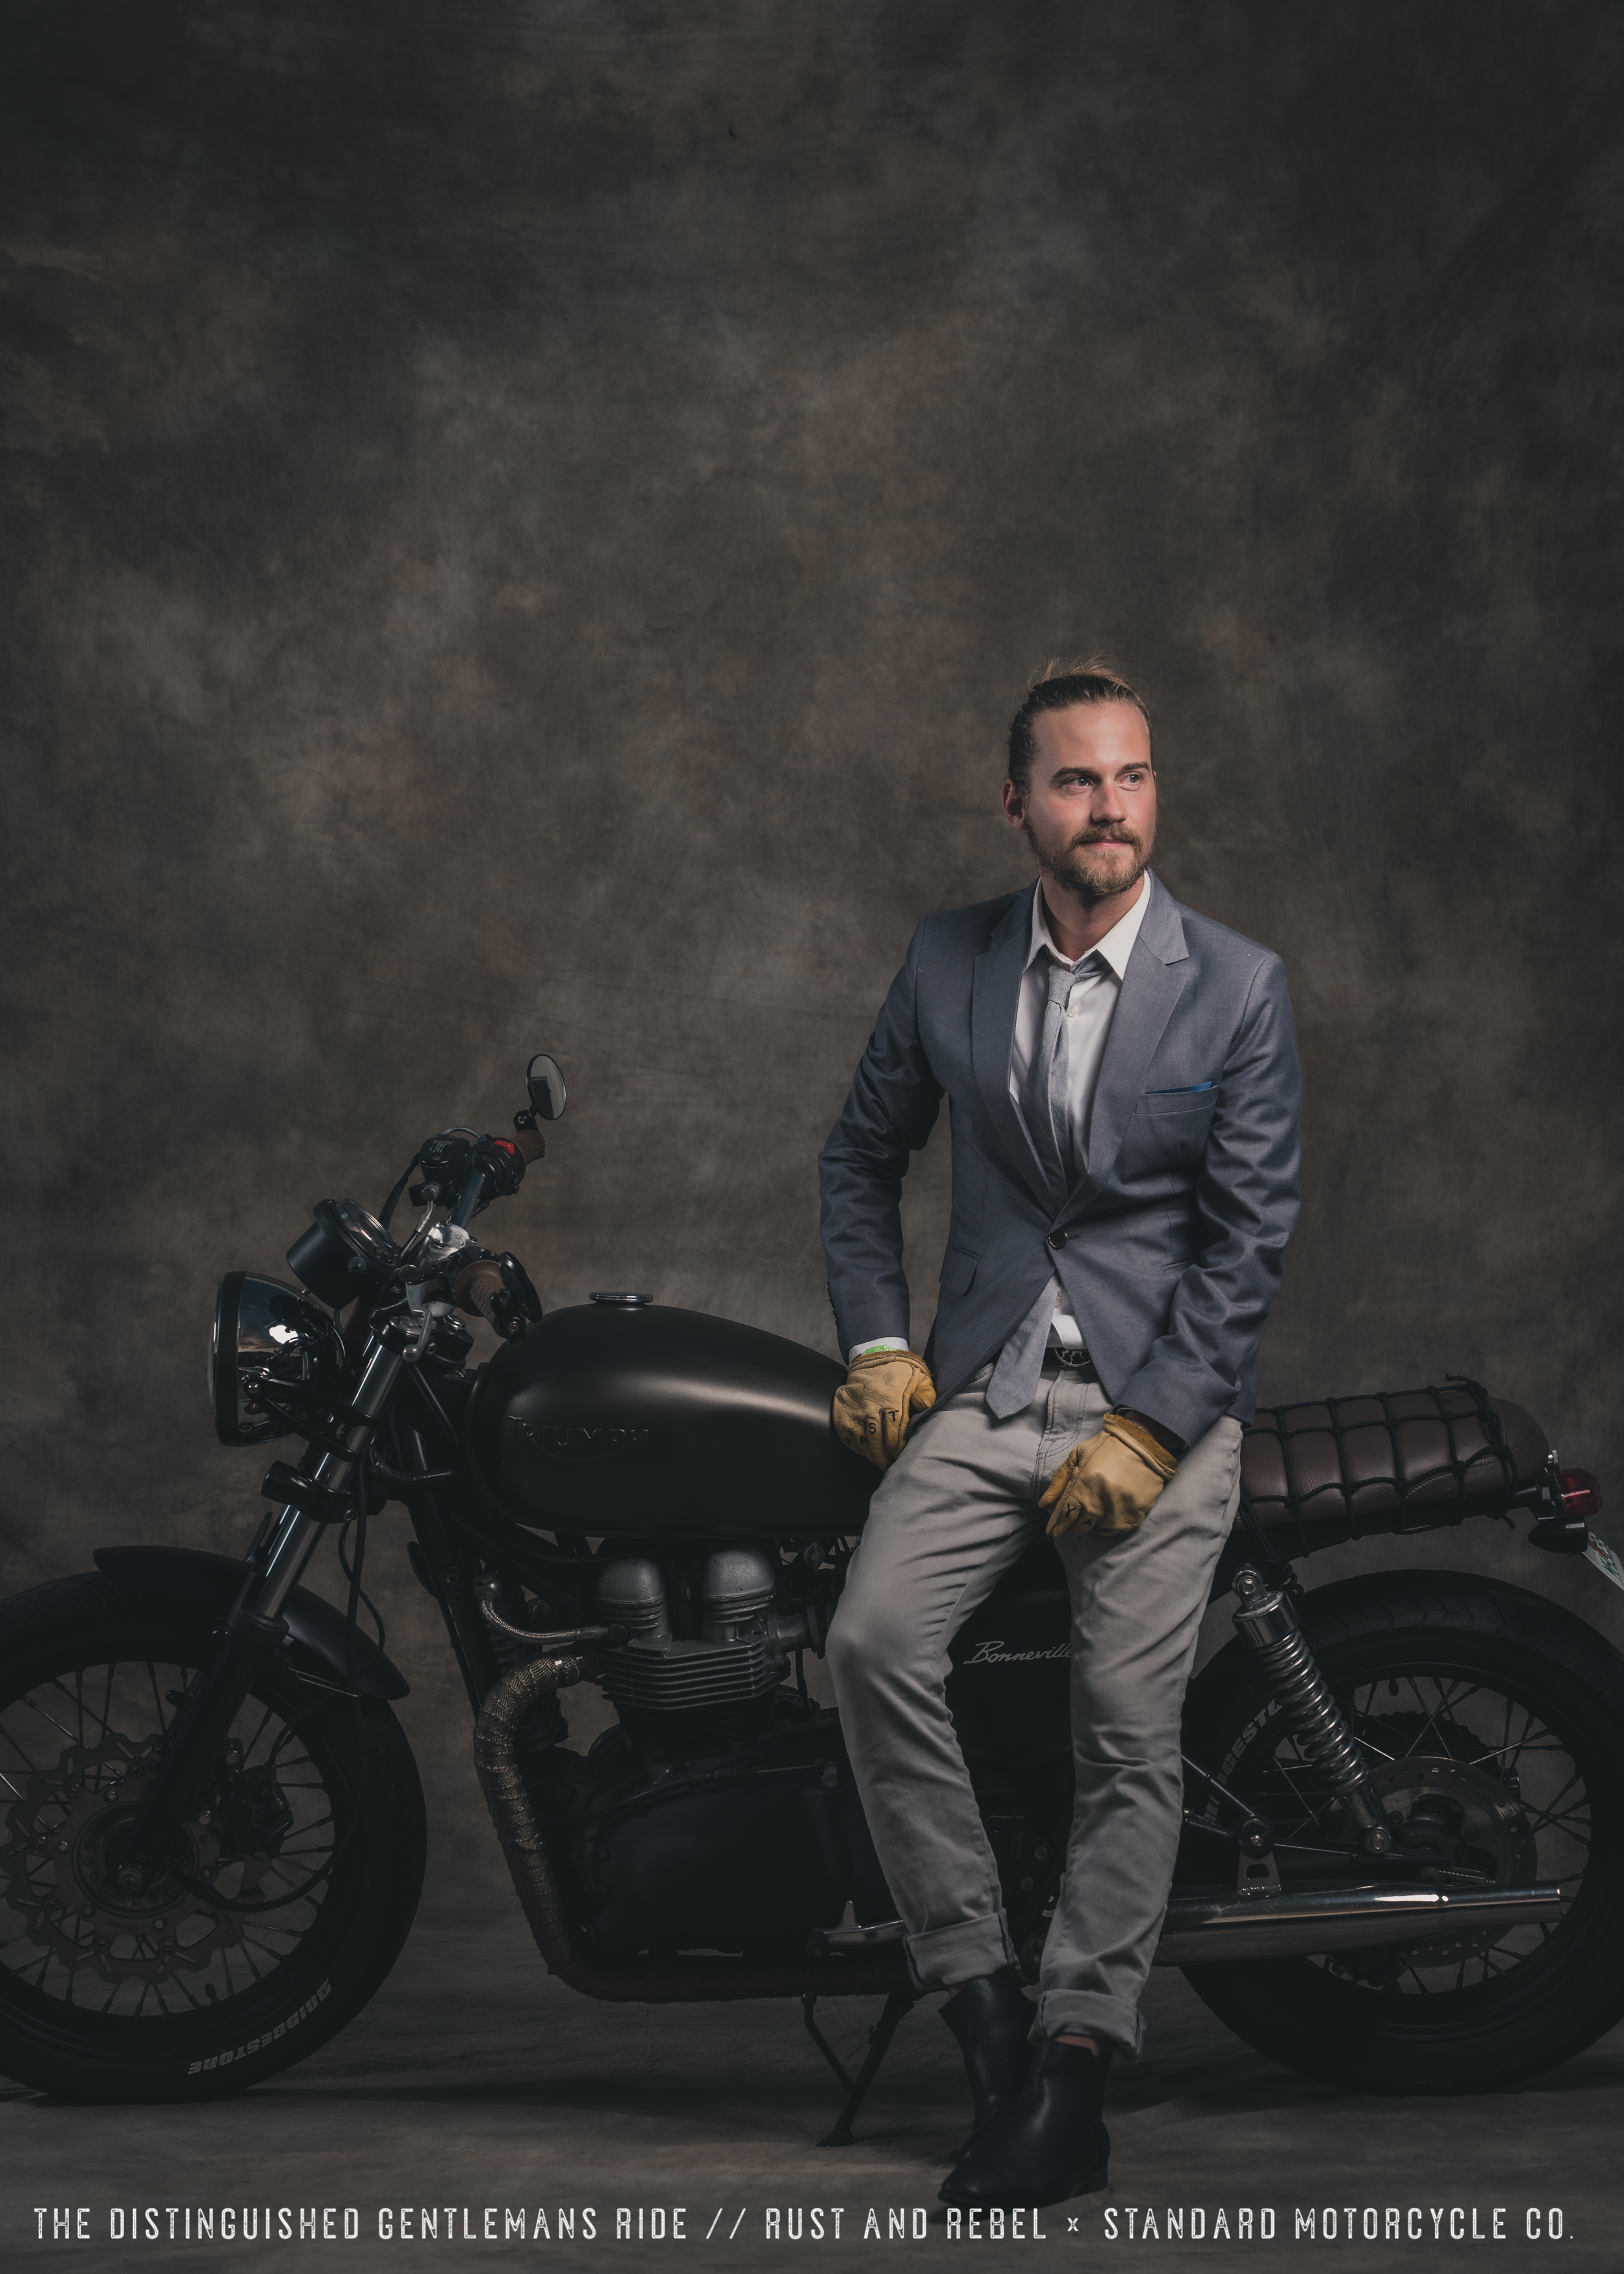 The Distinguished Gentleman's Ride 2019 [PEOPLE - PHOTO BY @MIKEDUNNUSA] - 0146.jpg